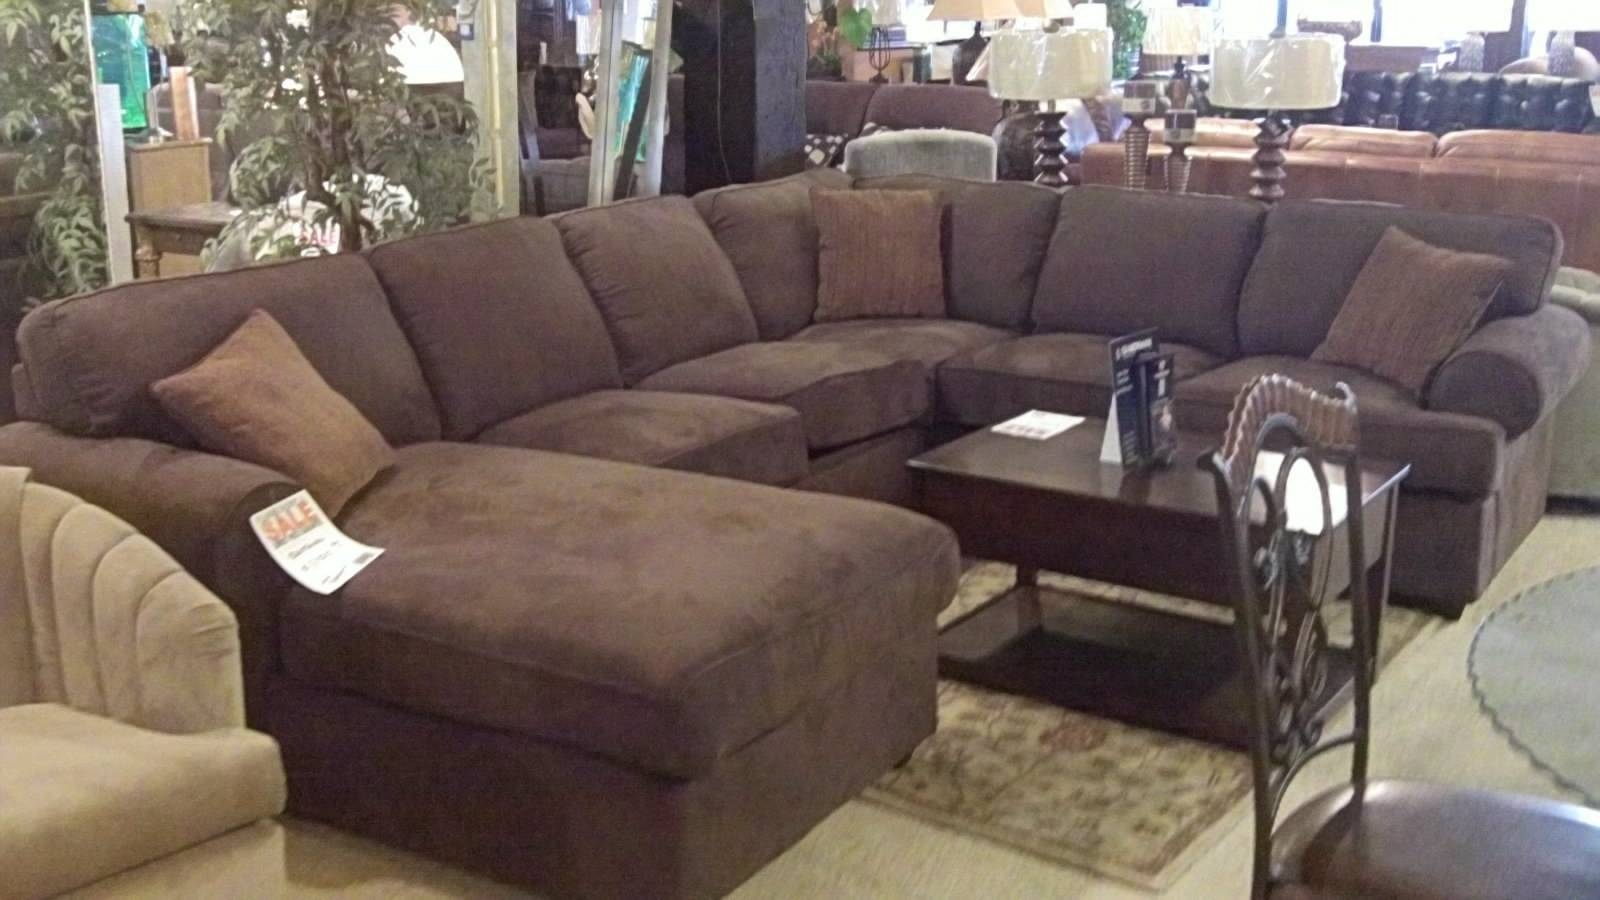 deep sectional sofa uno 2piece sectional sofa denim sectional in deep cushioned sofas - Deep Sectional Sofa